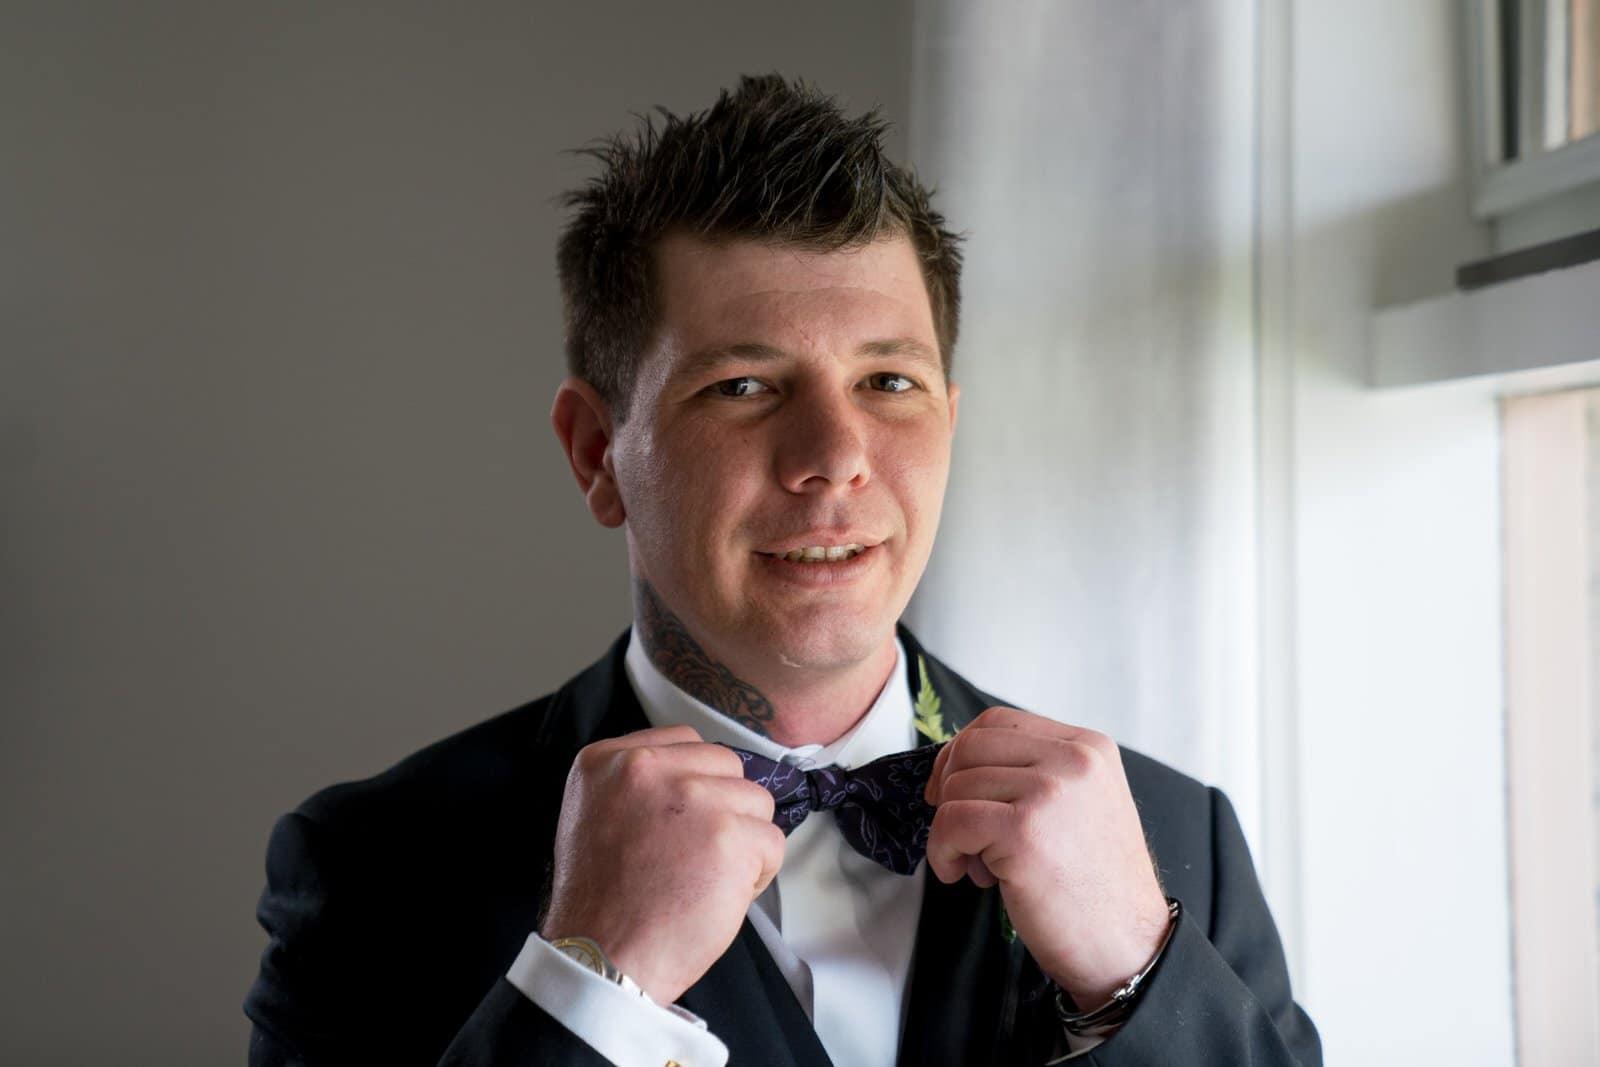 Melbourne Wedding Photographer Groom